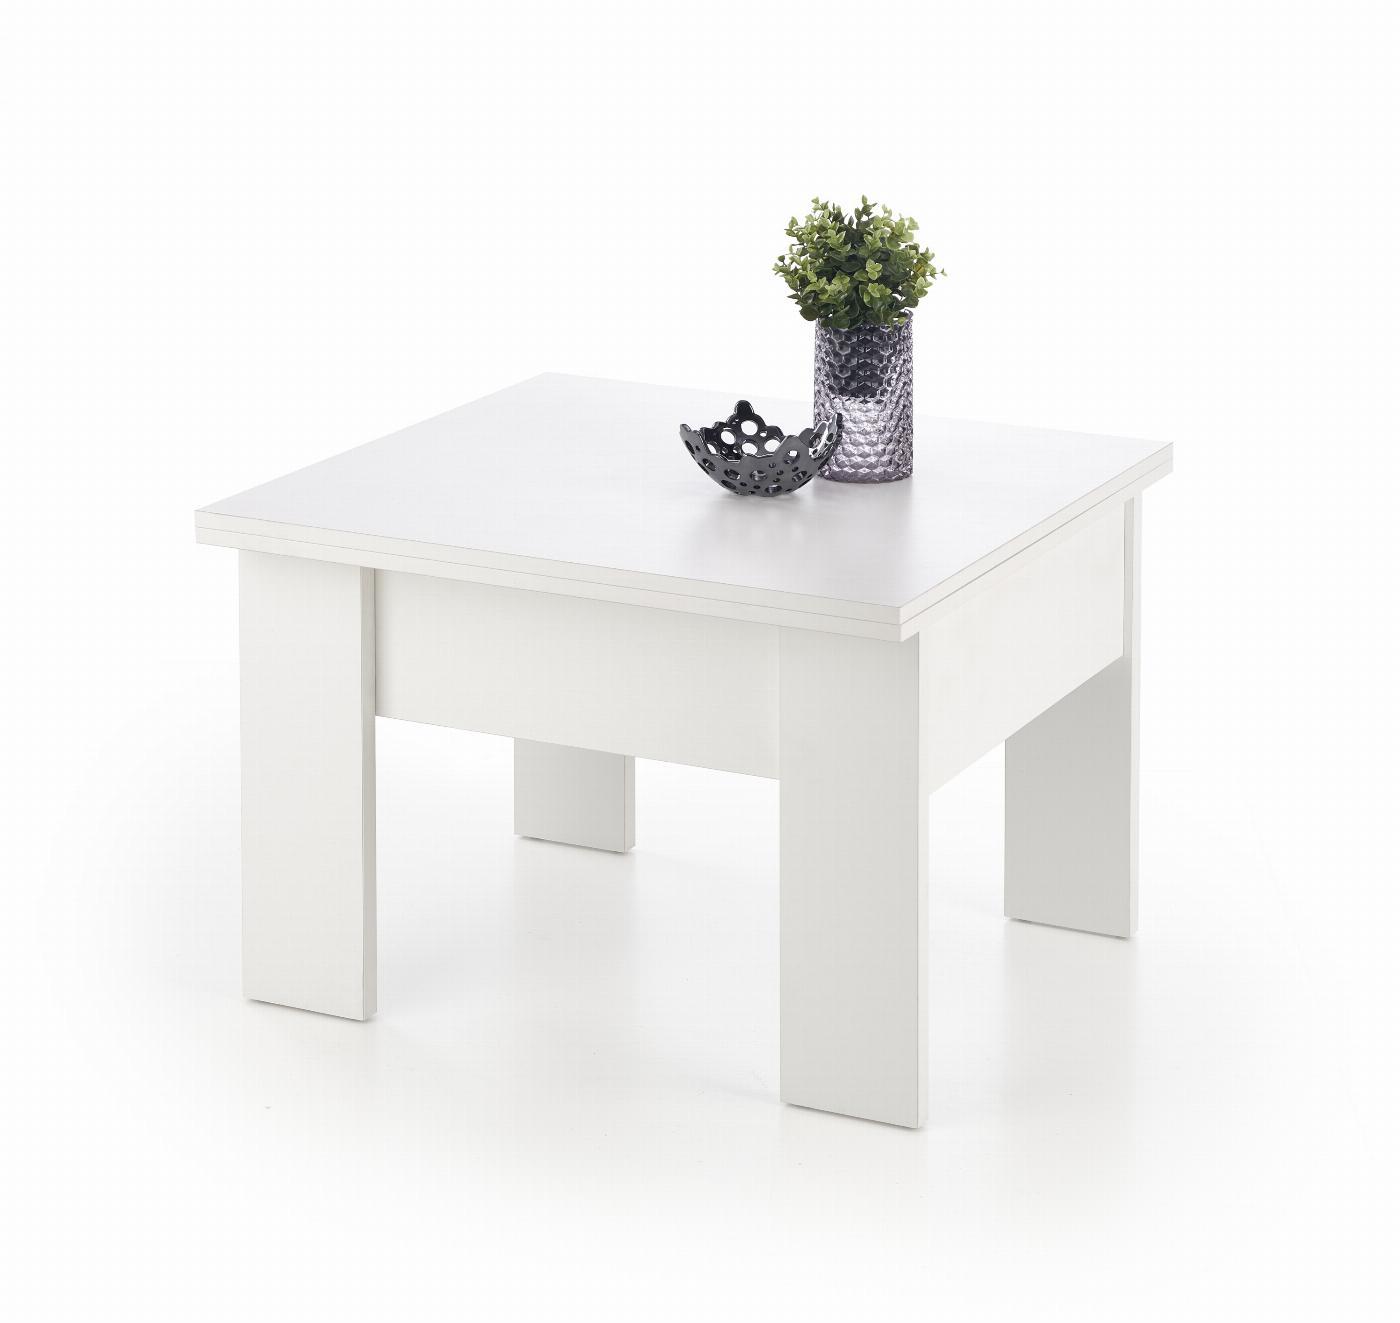 SERAFIN ławostół kolor biały (2p=1szt)